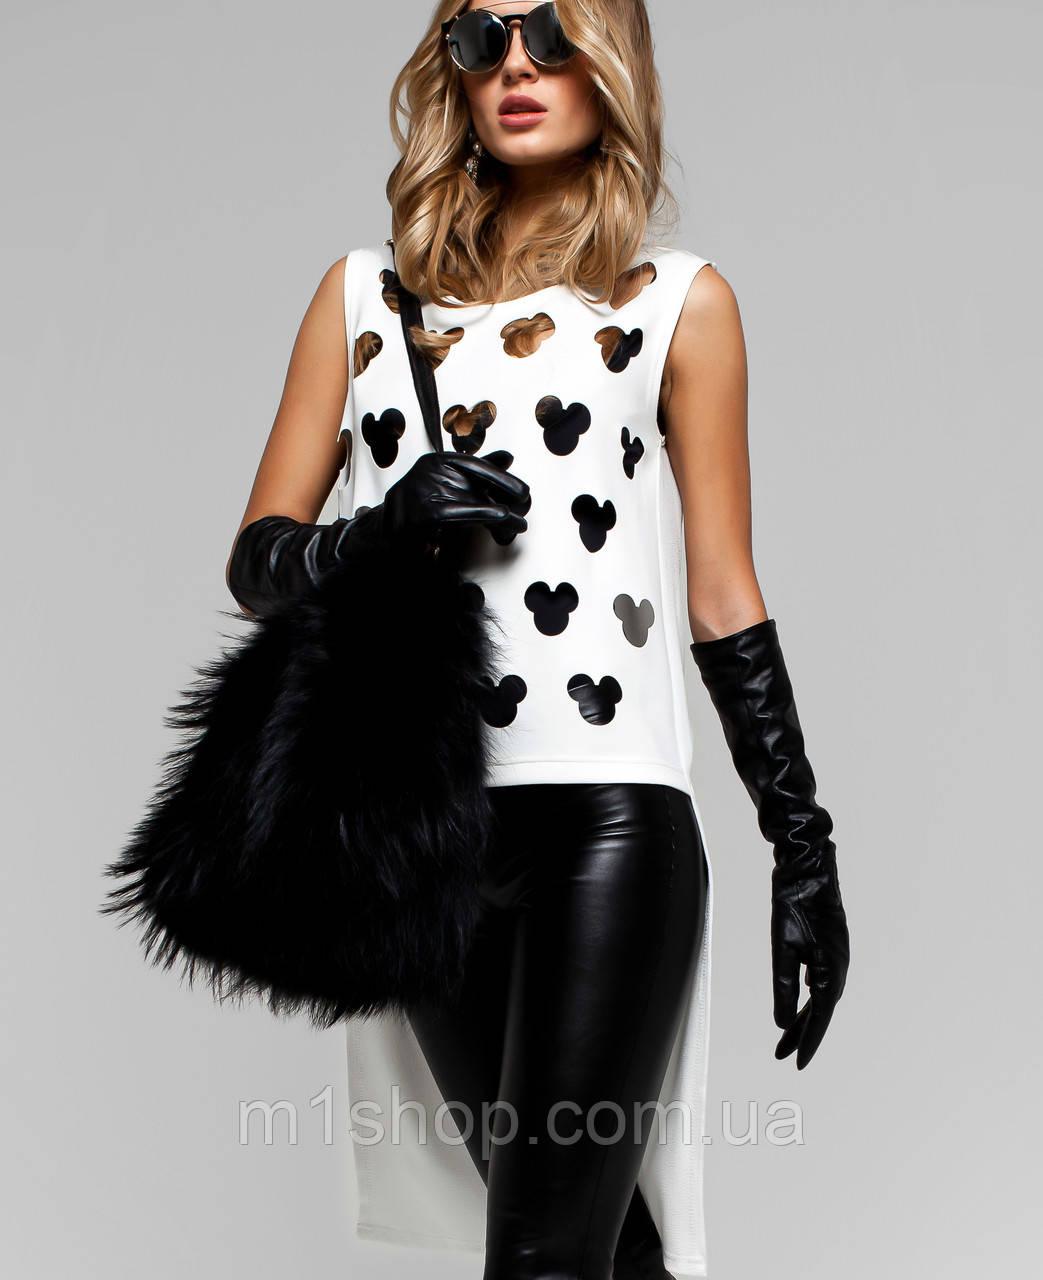 Женская туника-блузка (Микки jd)